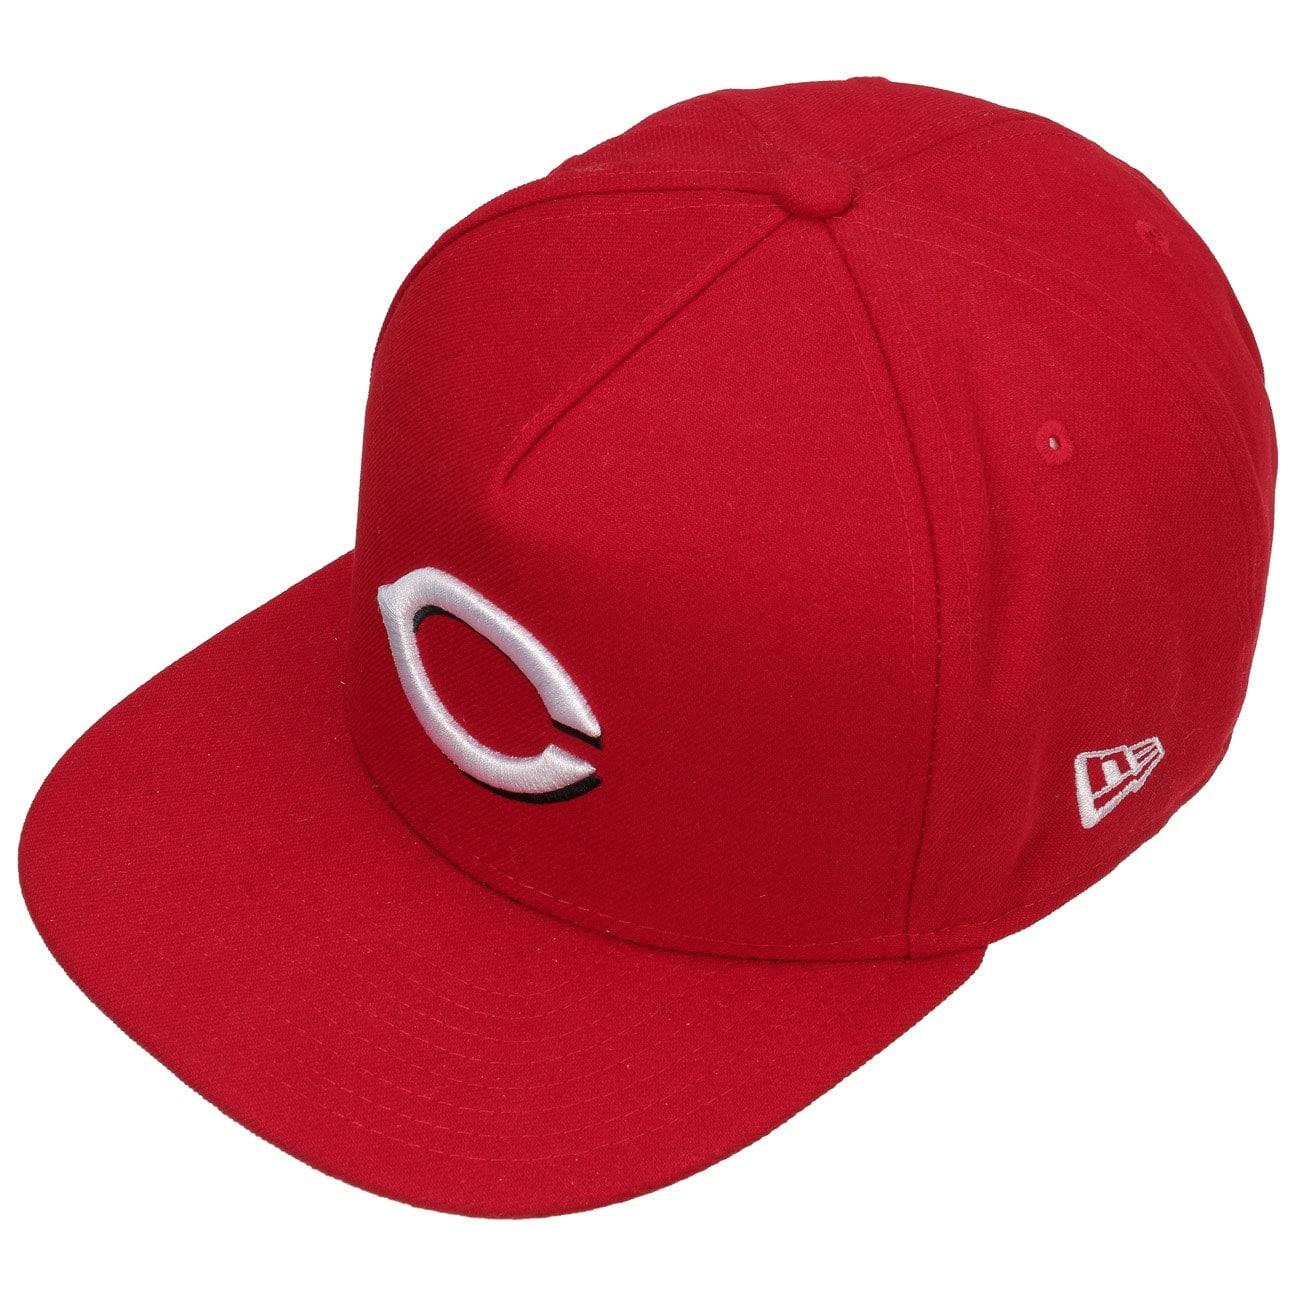 54955d737ba87 Cincinnati Reds Flatbrim Cap by New Era - Gorras - sombreroshop.es